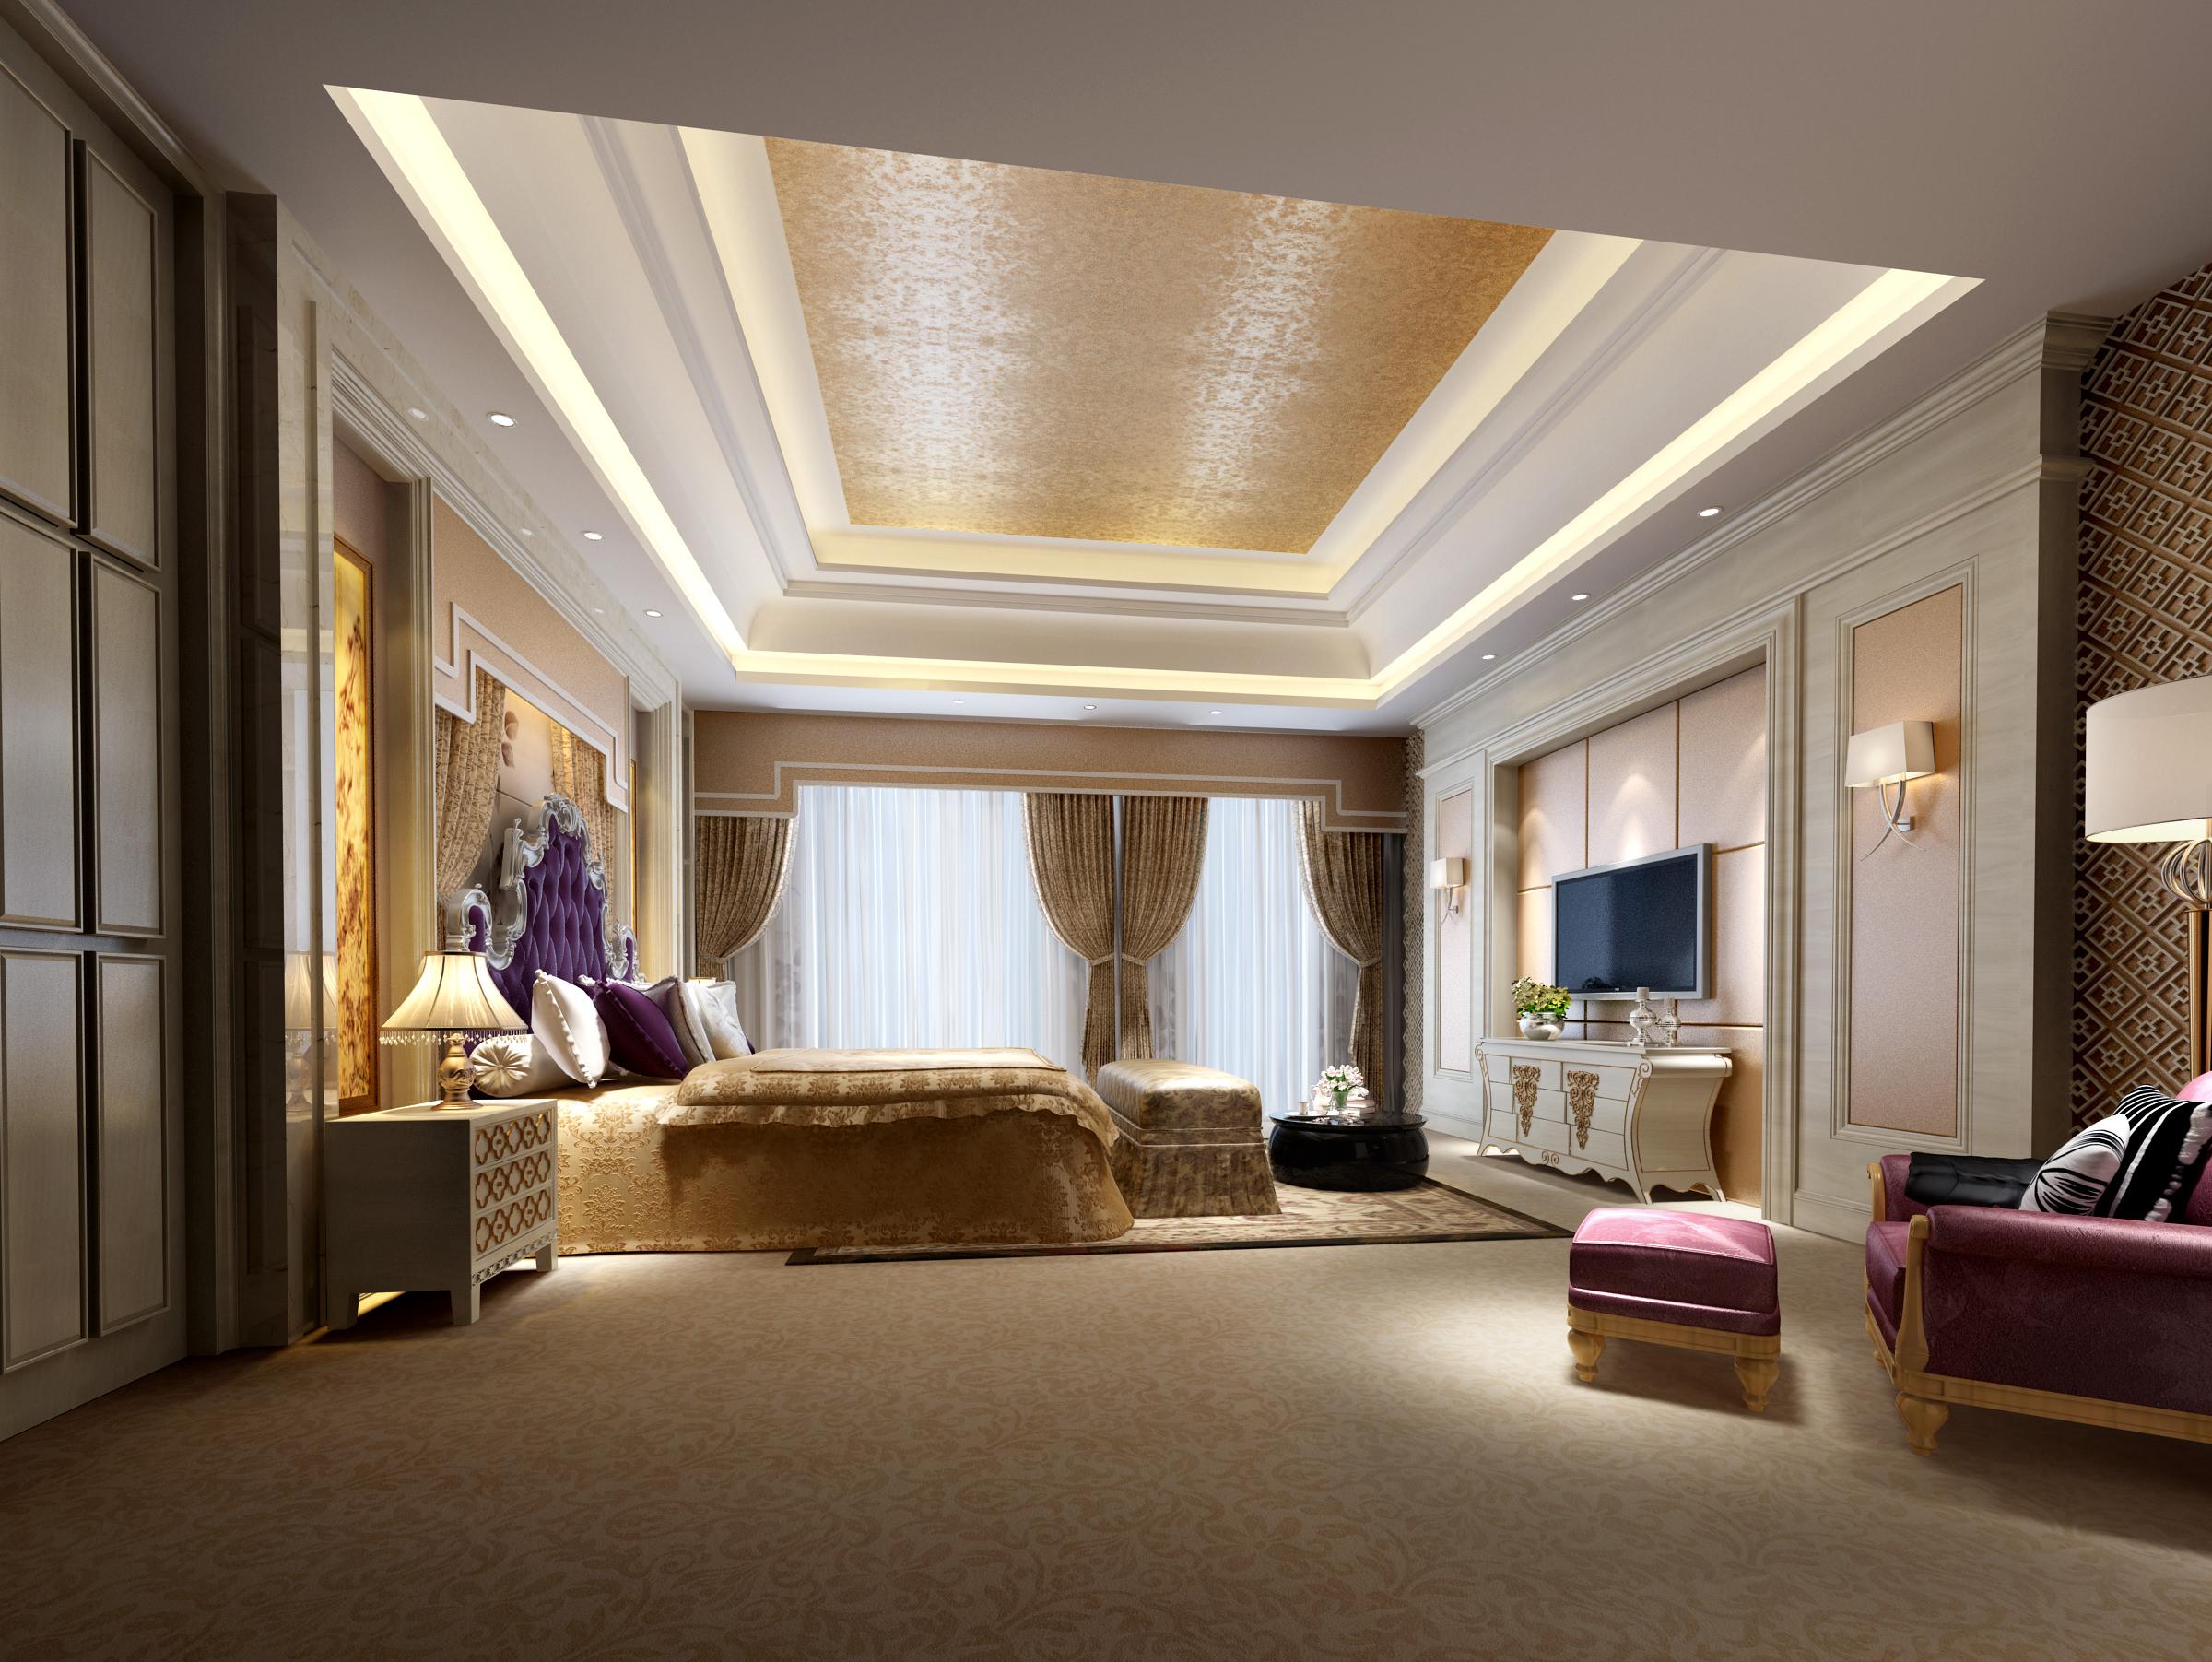 Model Bedroom Interior Design Collection Living Room And Bedroom Collection 1 3d Model Max